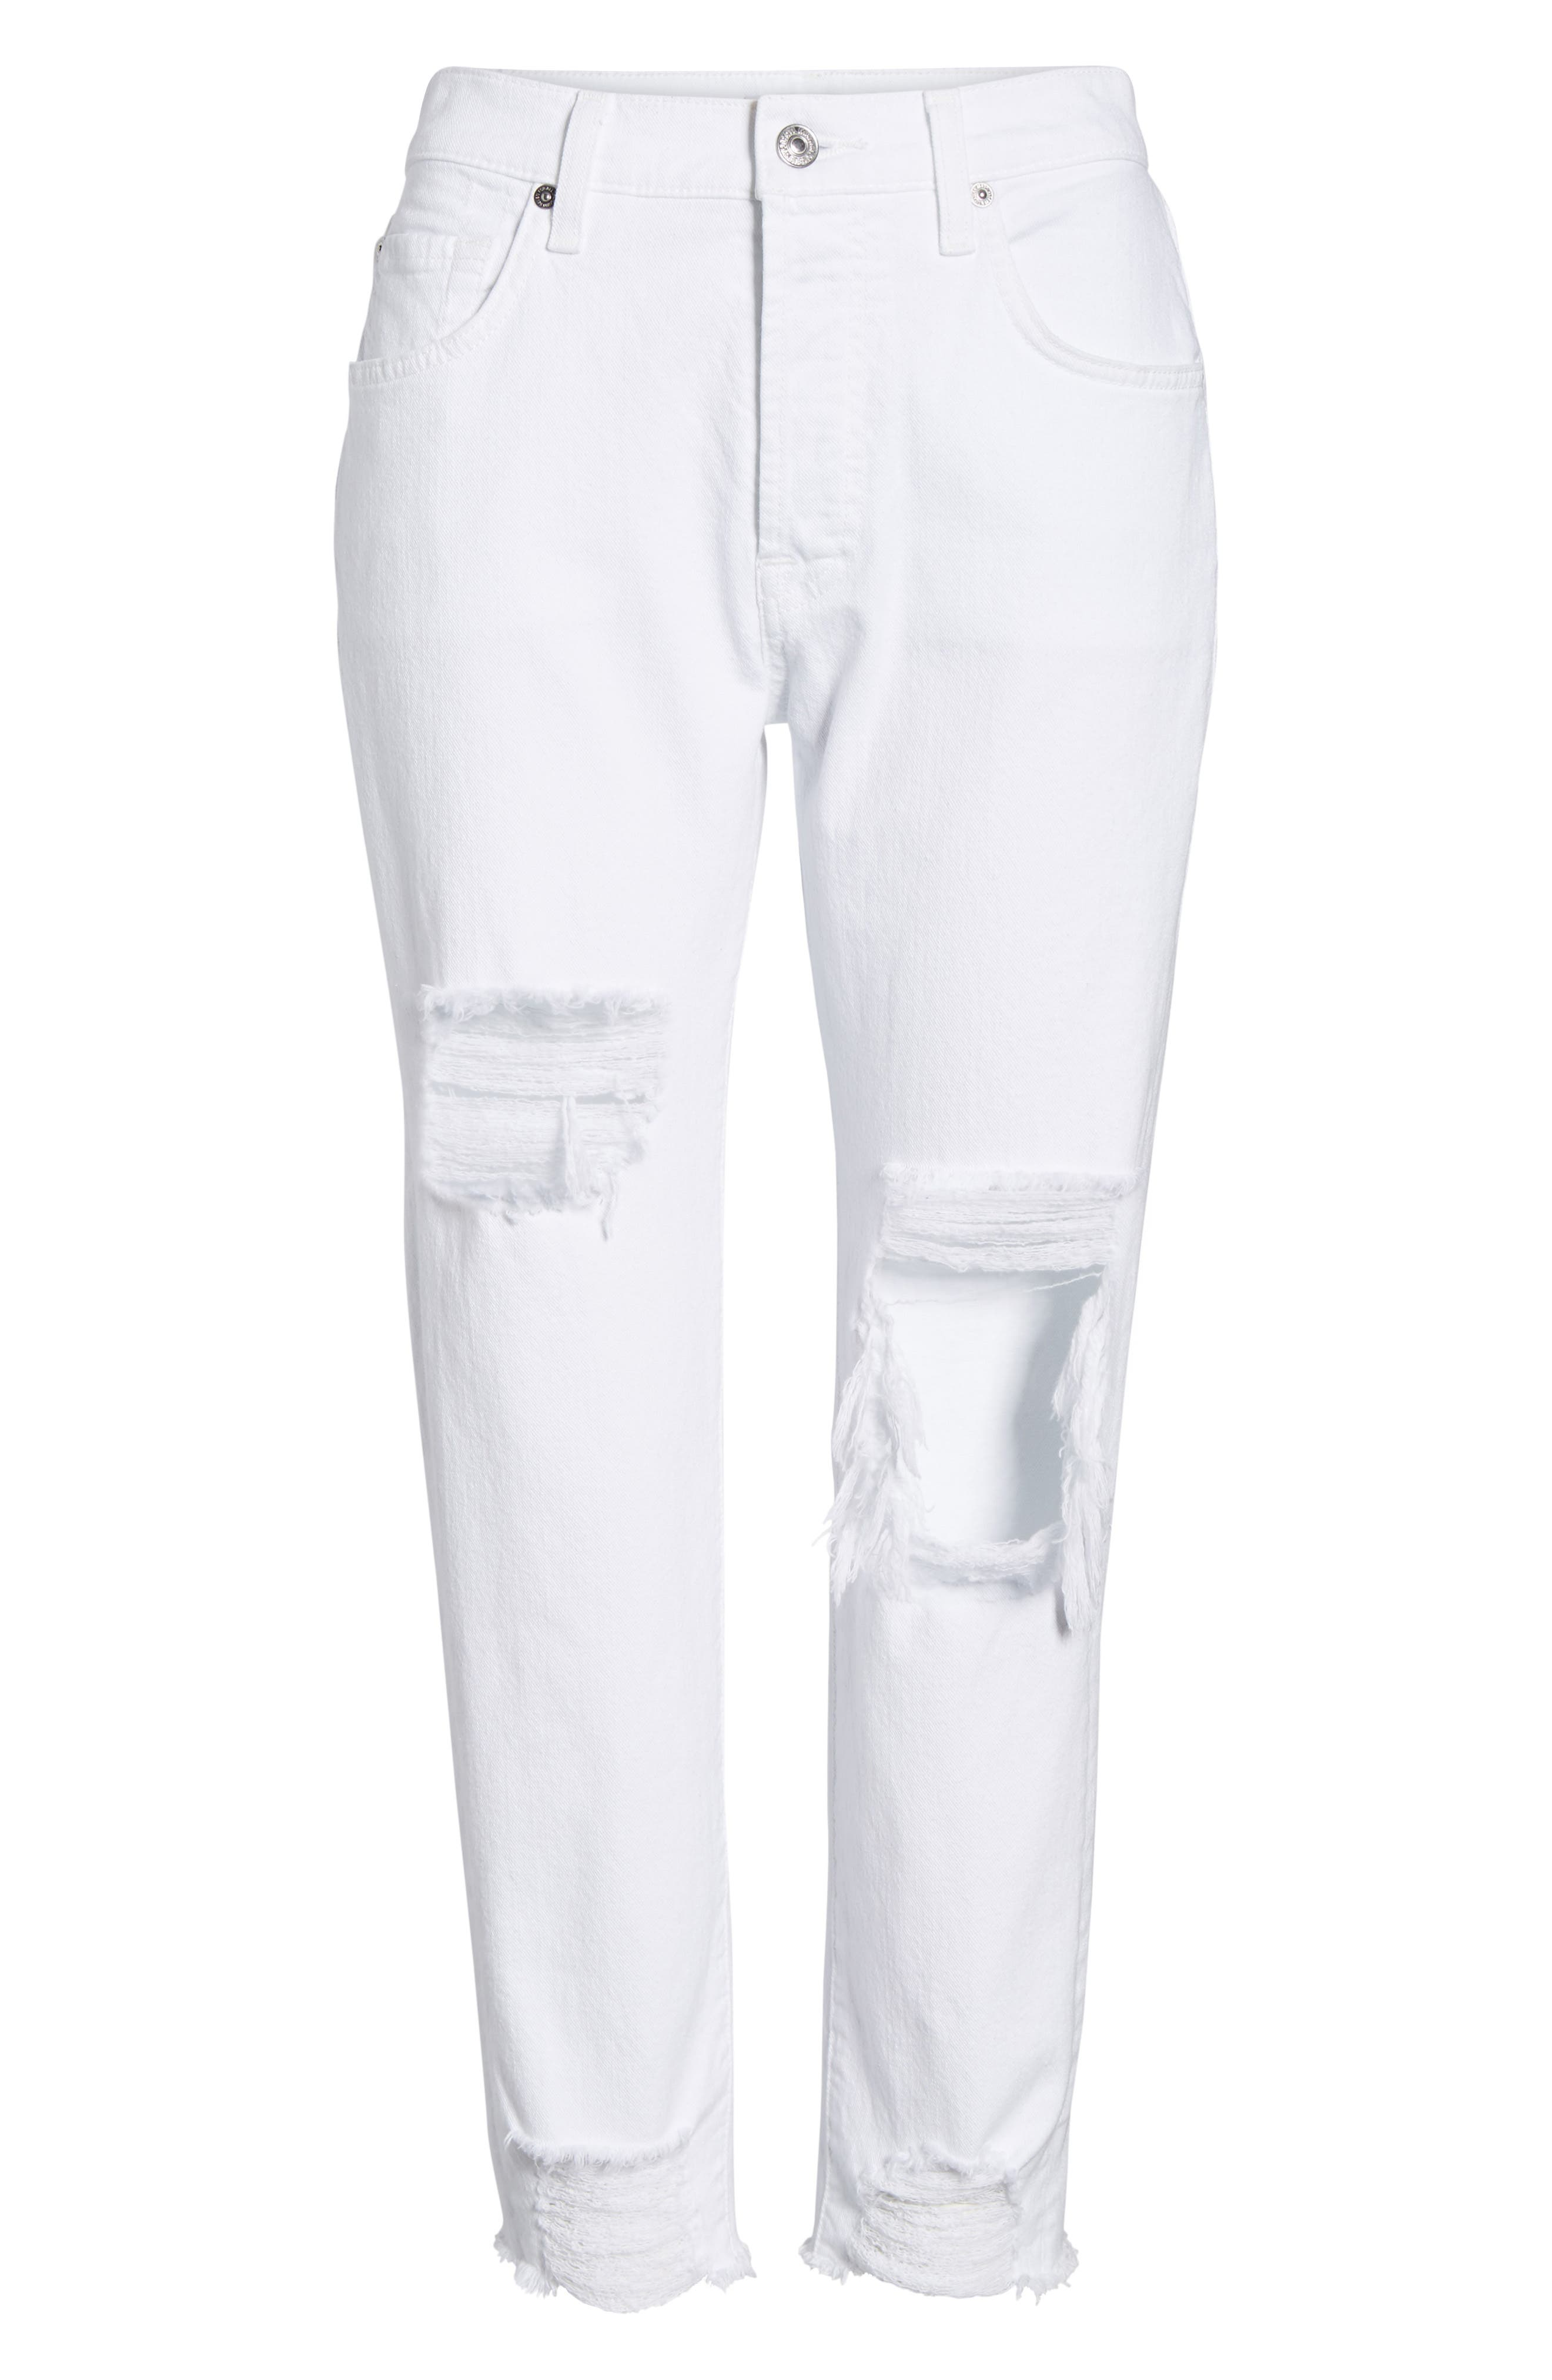 Josefina High Waist Boyfriend Jeans,                             Alternate thumbnail 7, color,                             White Fashion 2